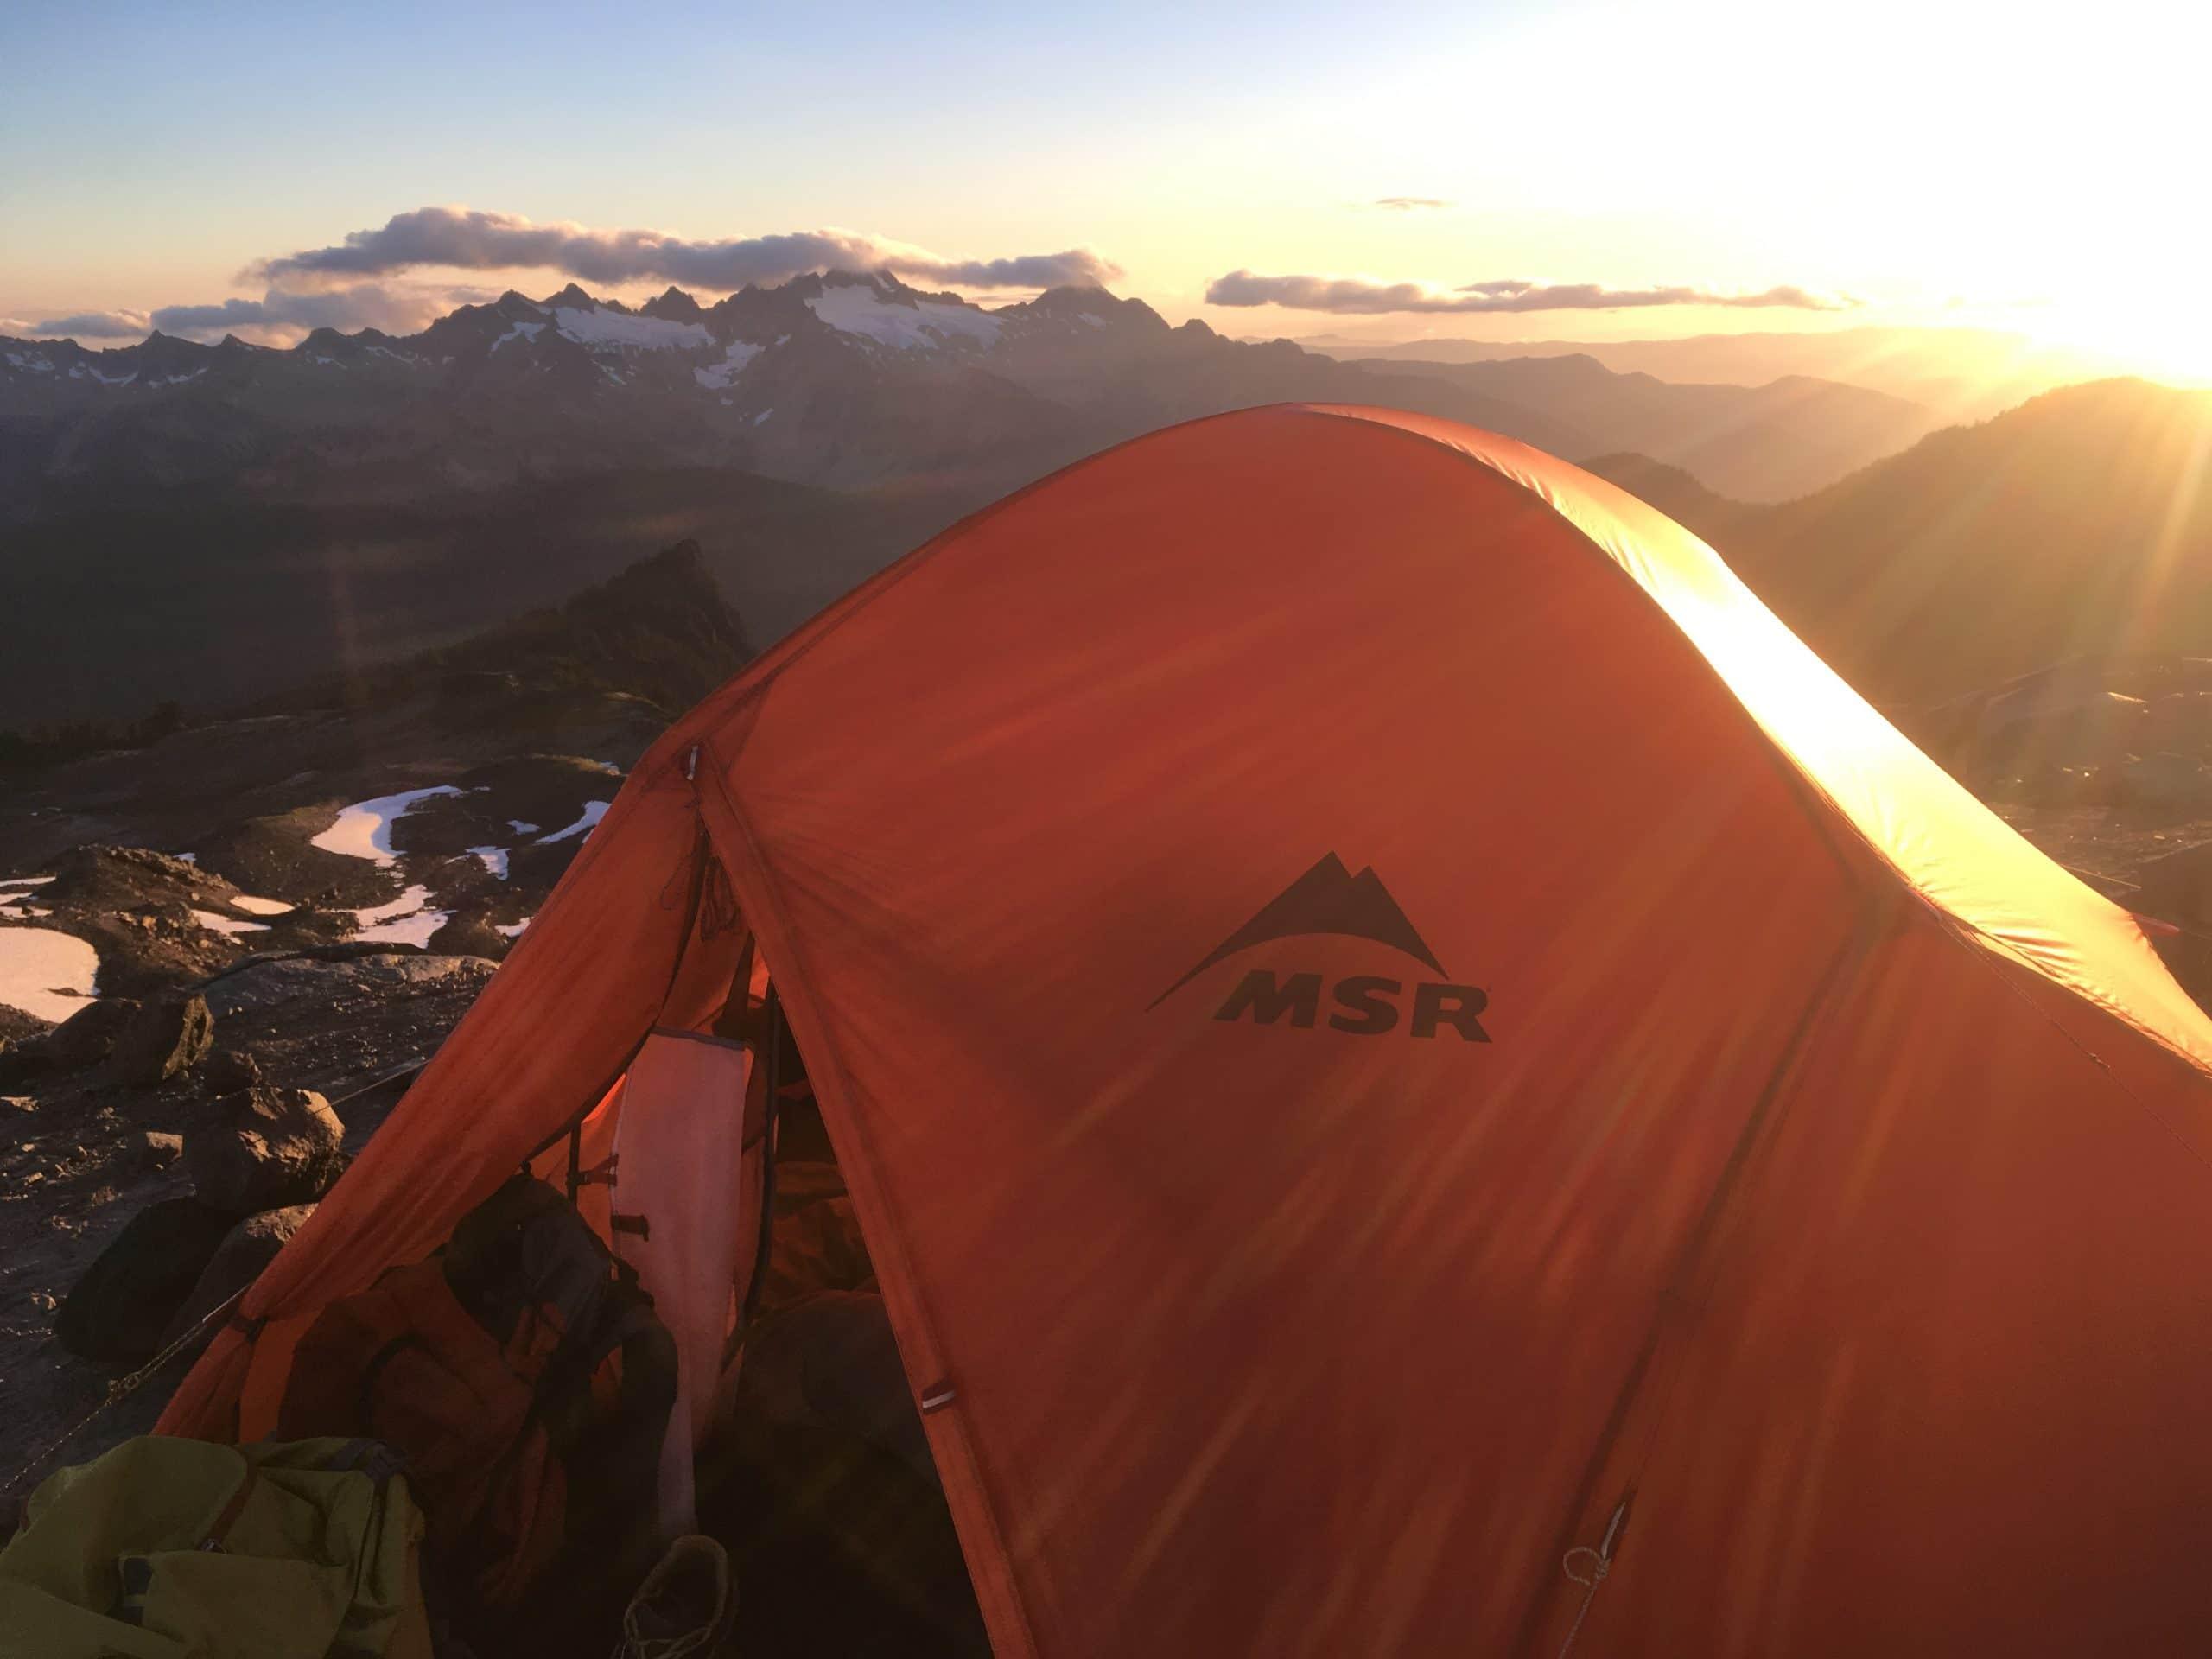 f441cc25c59 Product Spotlight: MSR Access Tents - Alpine Ascents International